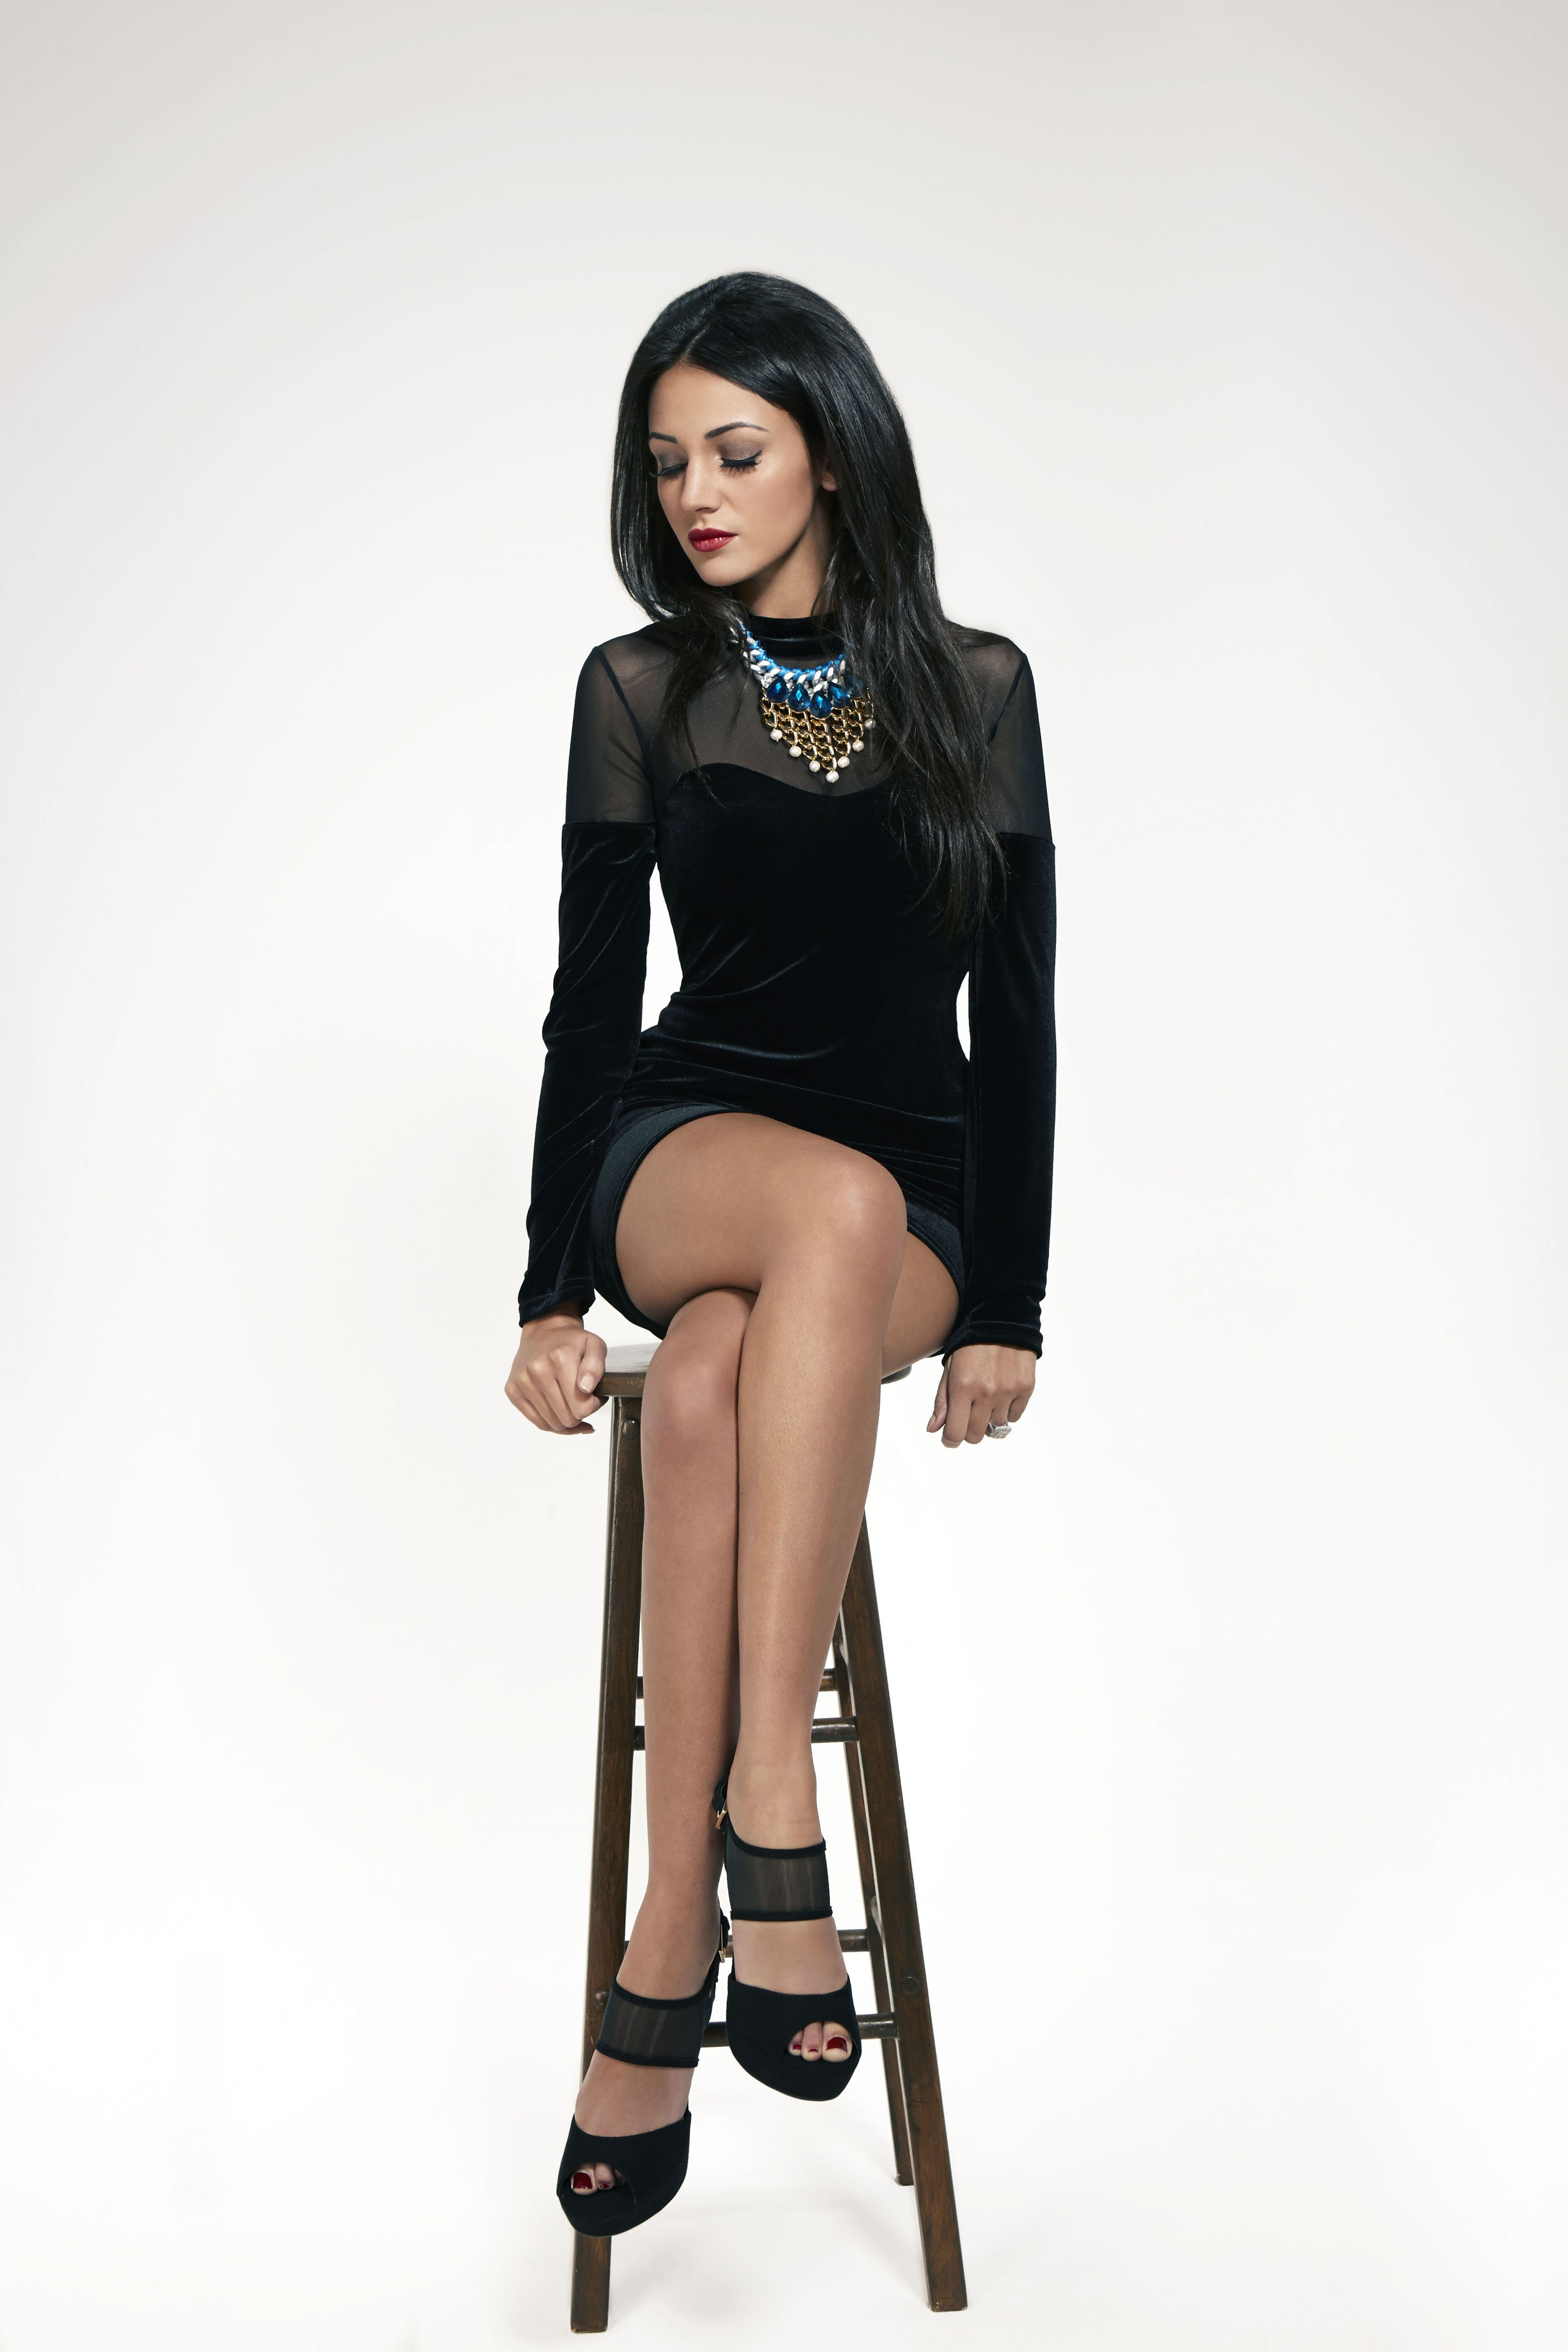 c3323a58dc88 Michelle Keegan in The Sun TV Magazine 2014